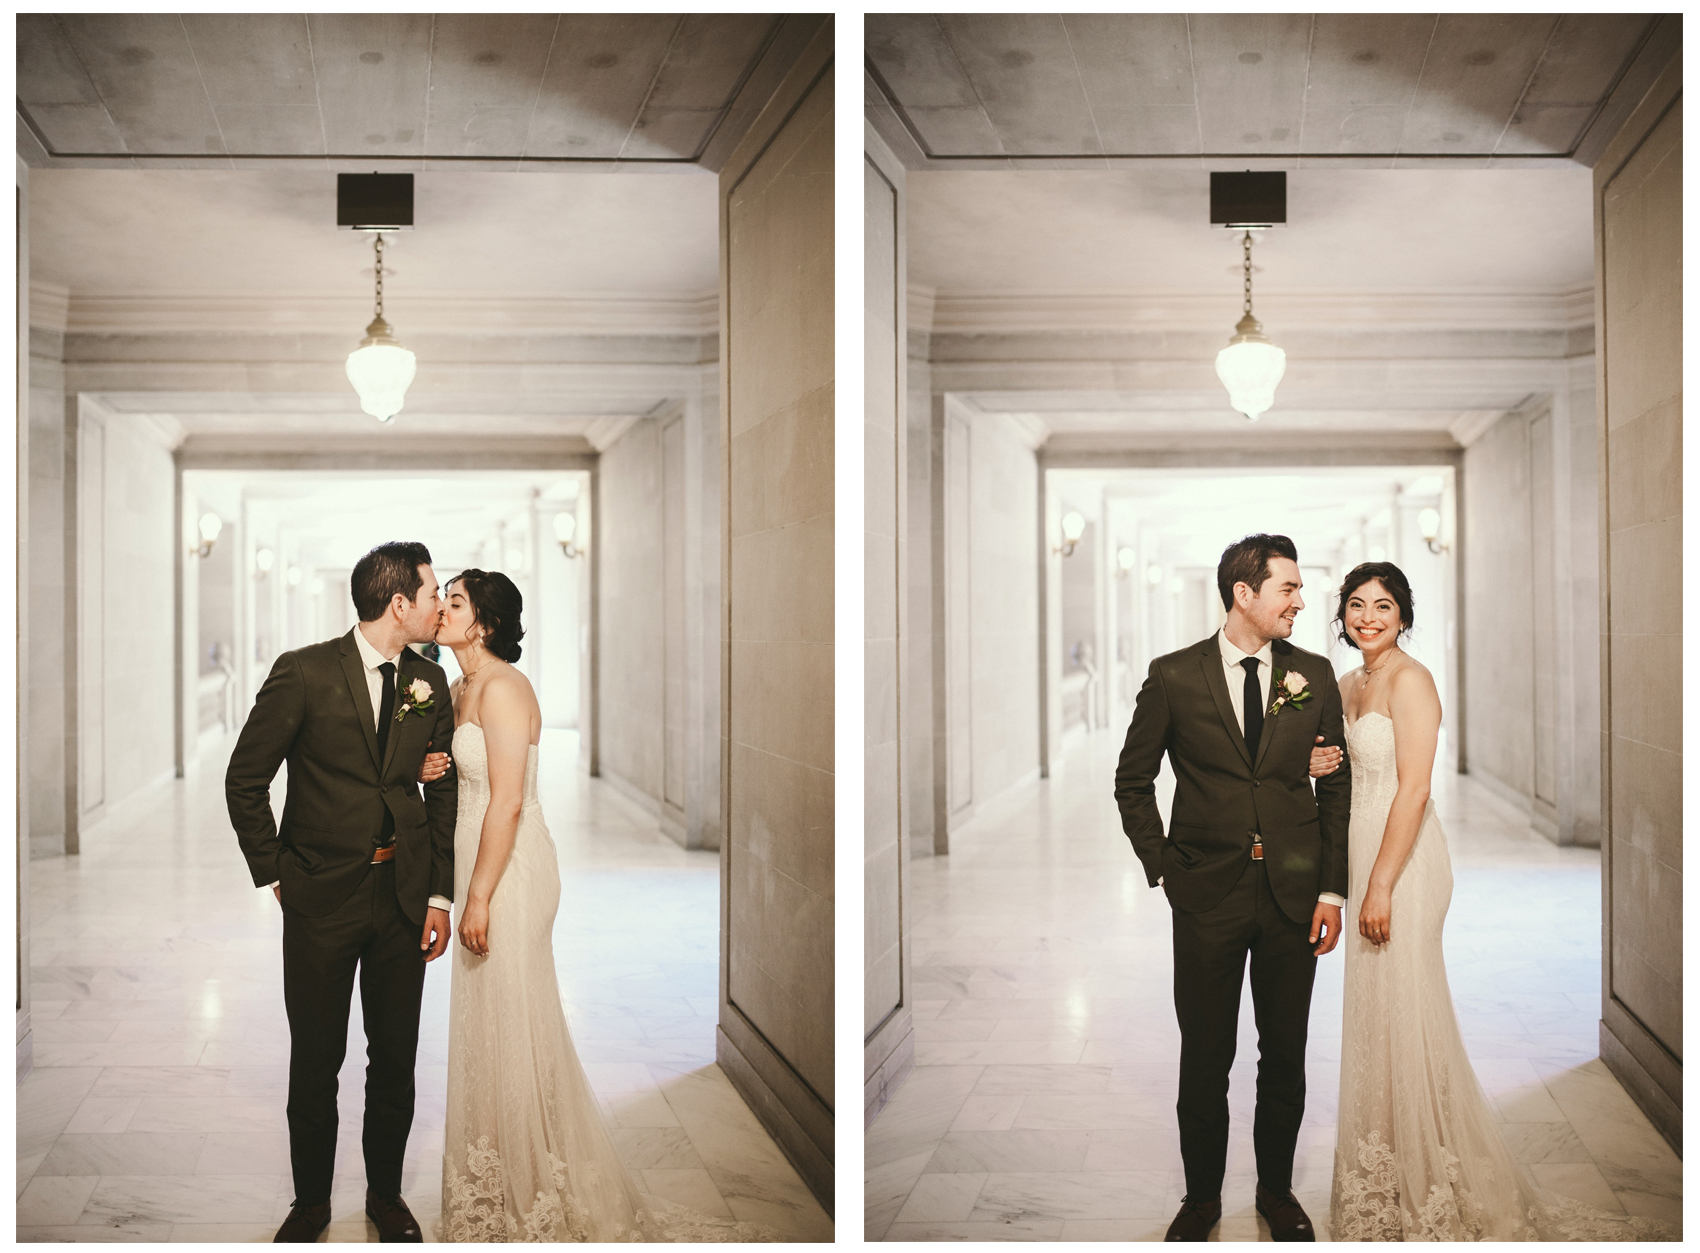 San Francisco City Hall & Stable Cafe Wedding Photography Double 8.jpg